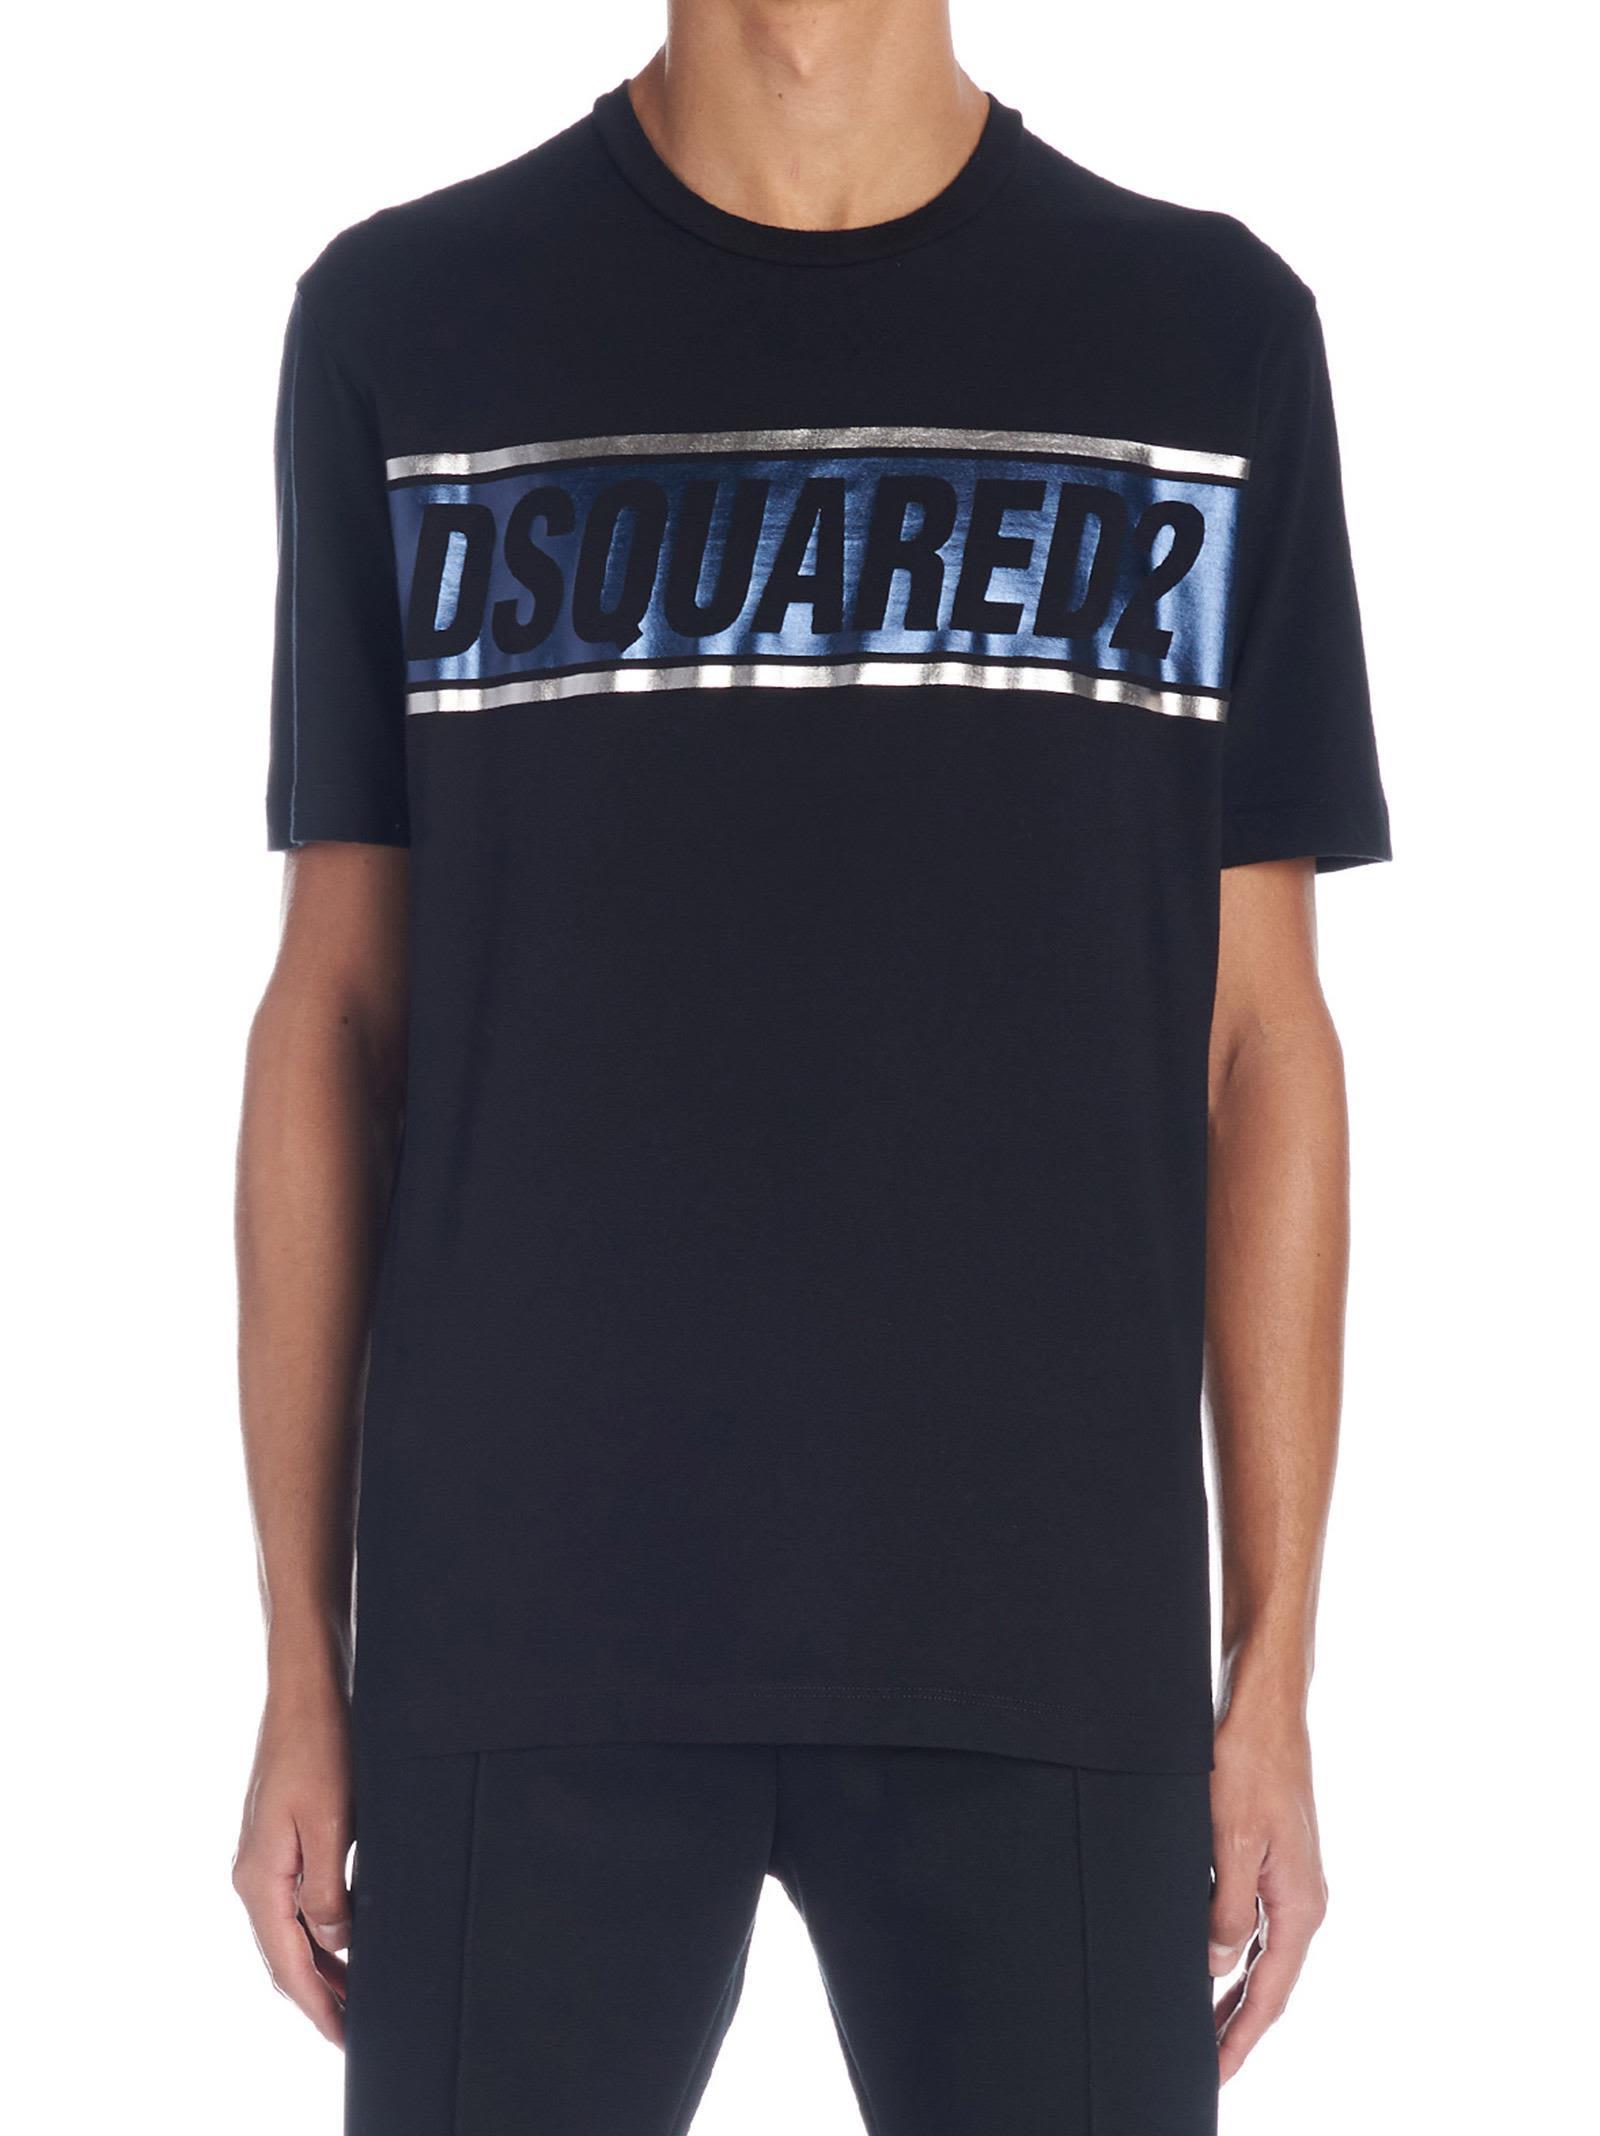 Dsquared2 'dsquared2' T-shirt